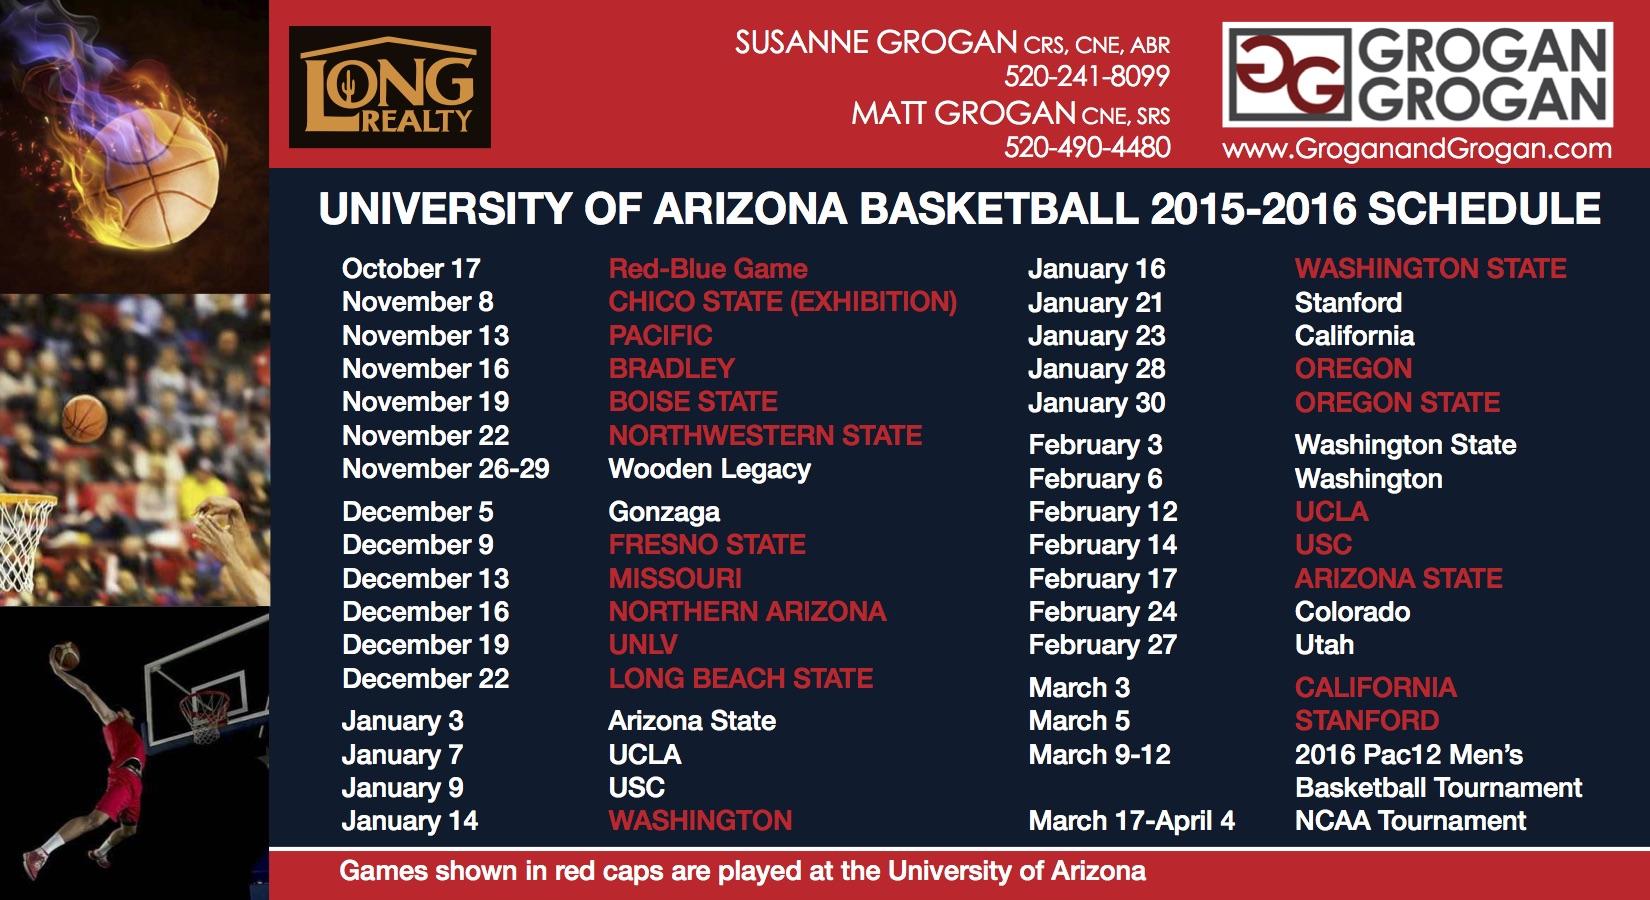 U of A Basketball Schedule